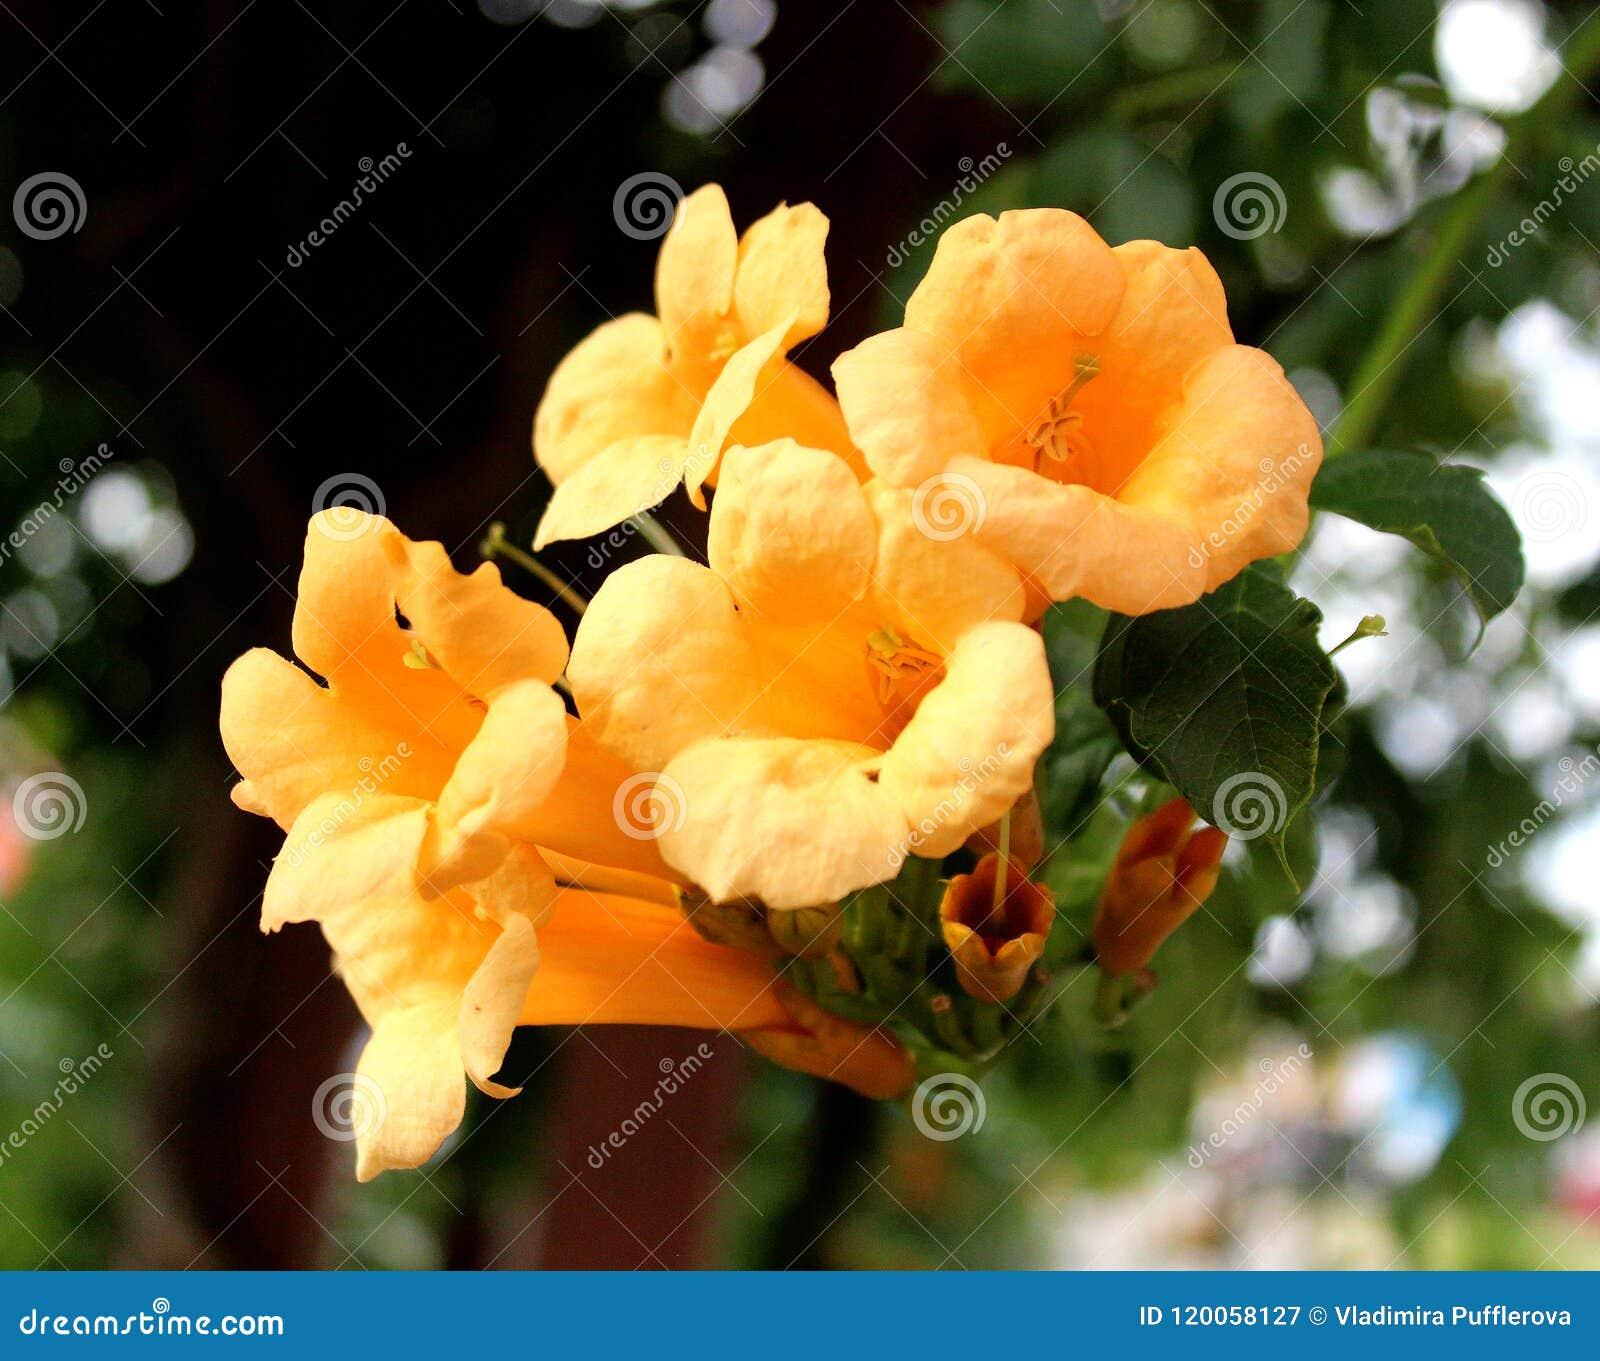 Trumpet Vine Favourite Ornamental Plant Stock Image Image Of